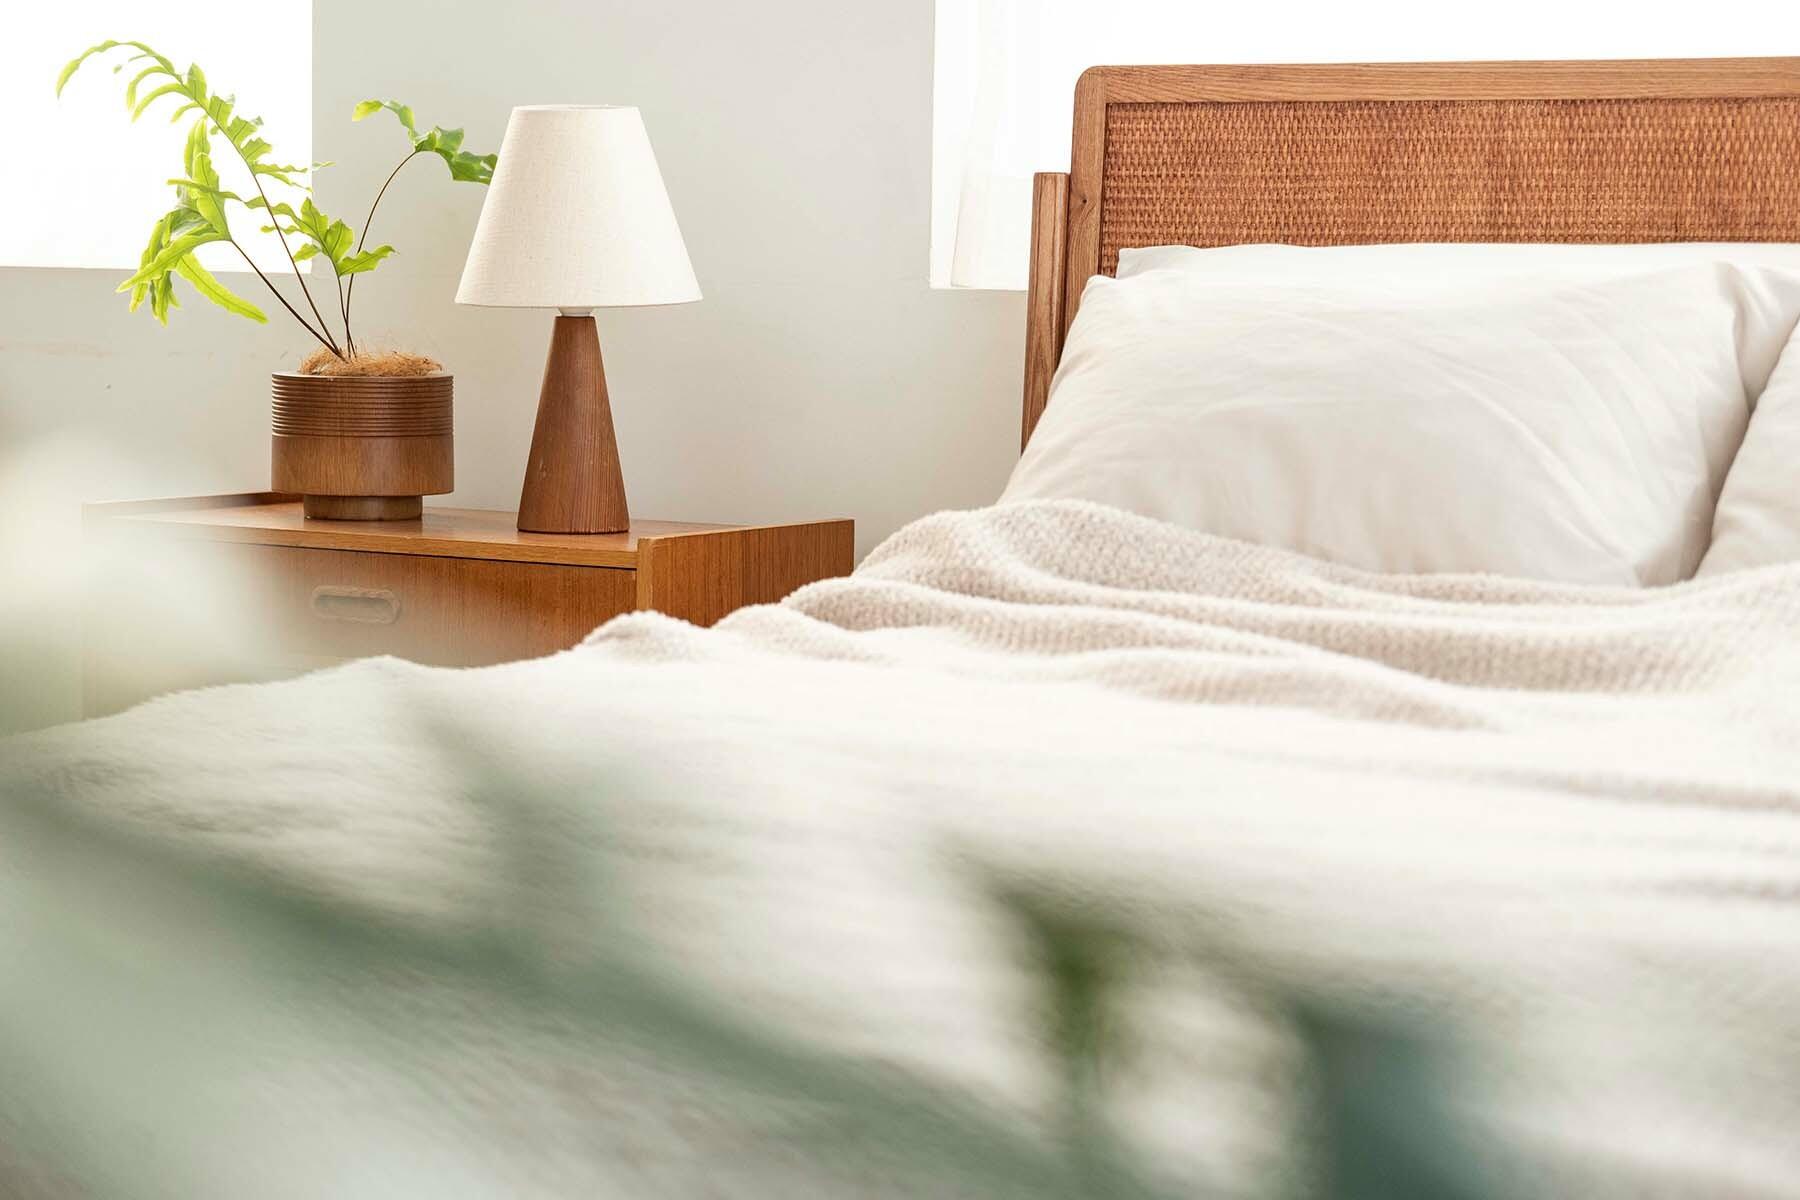 inTHE studio/nakameguro (インザスタジオ/ナカメグロ)Equipment